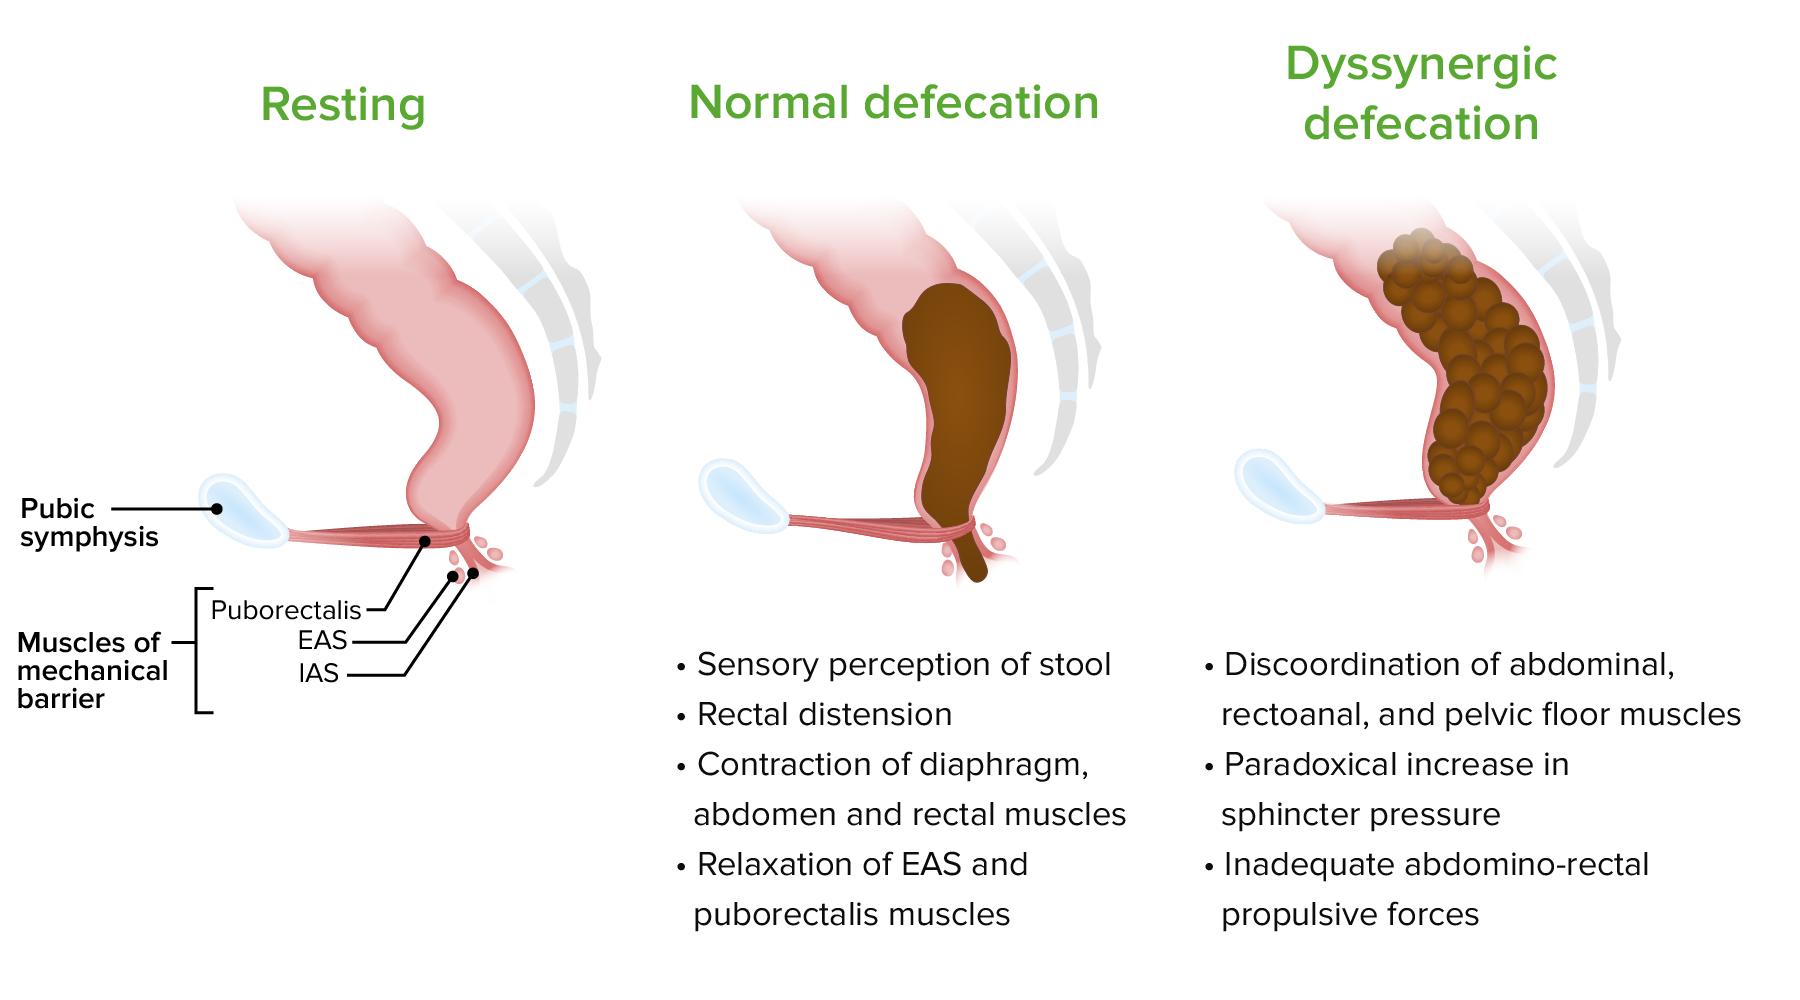 Pathophysiology of dyssynergic defecation